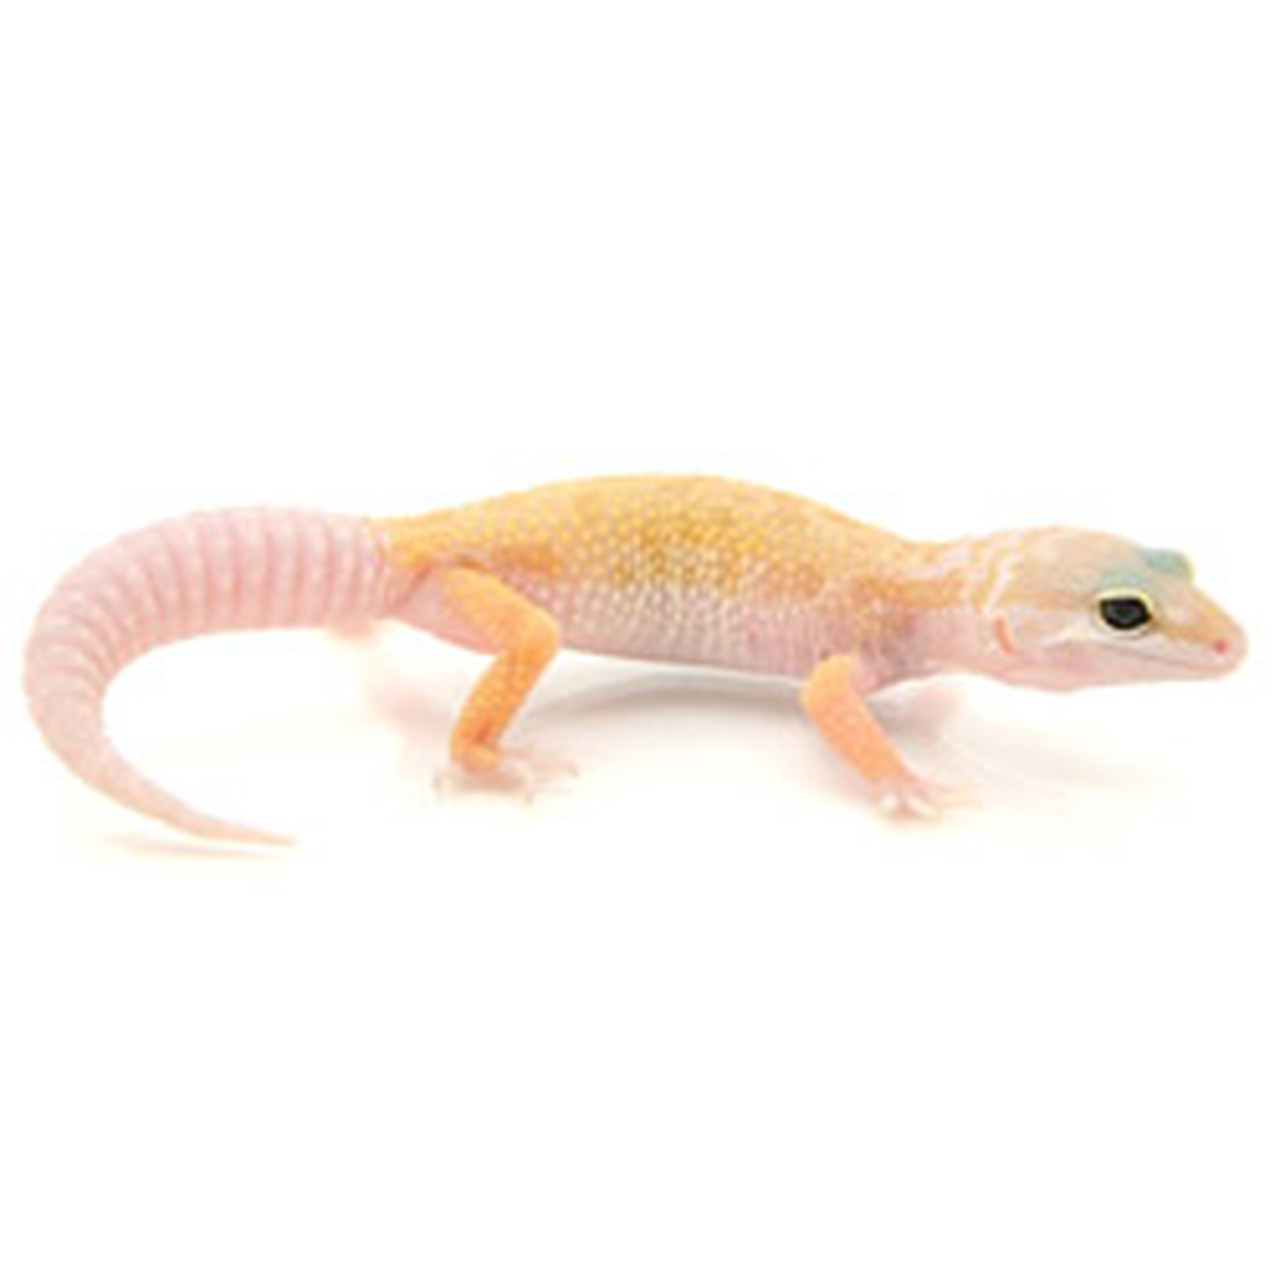 Leucistic Leopard Gecko (Eublepharis macularius) Juvenile